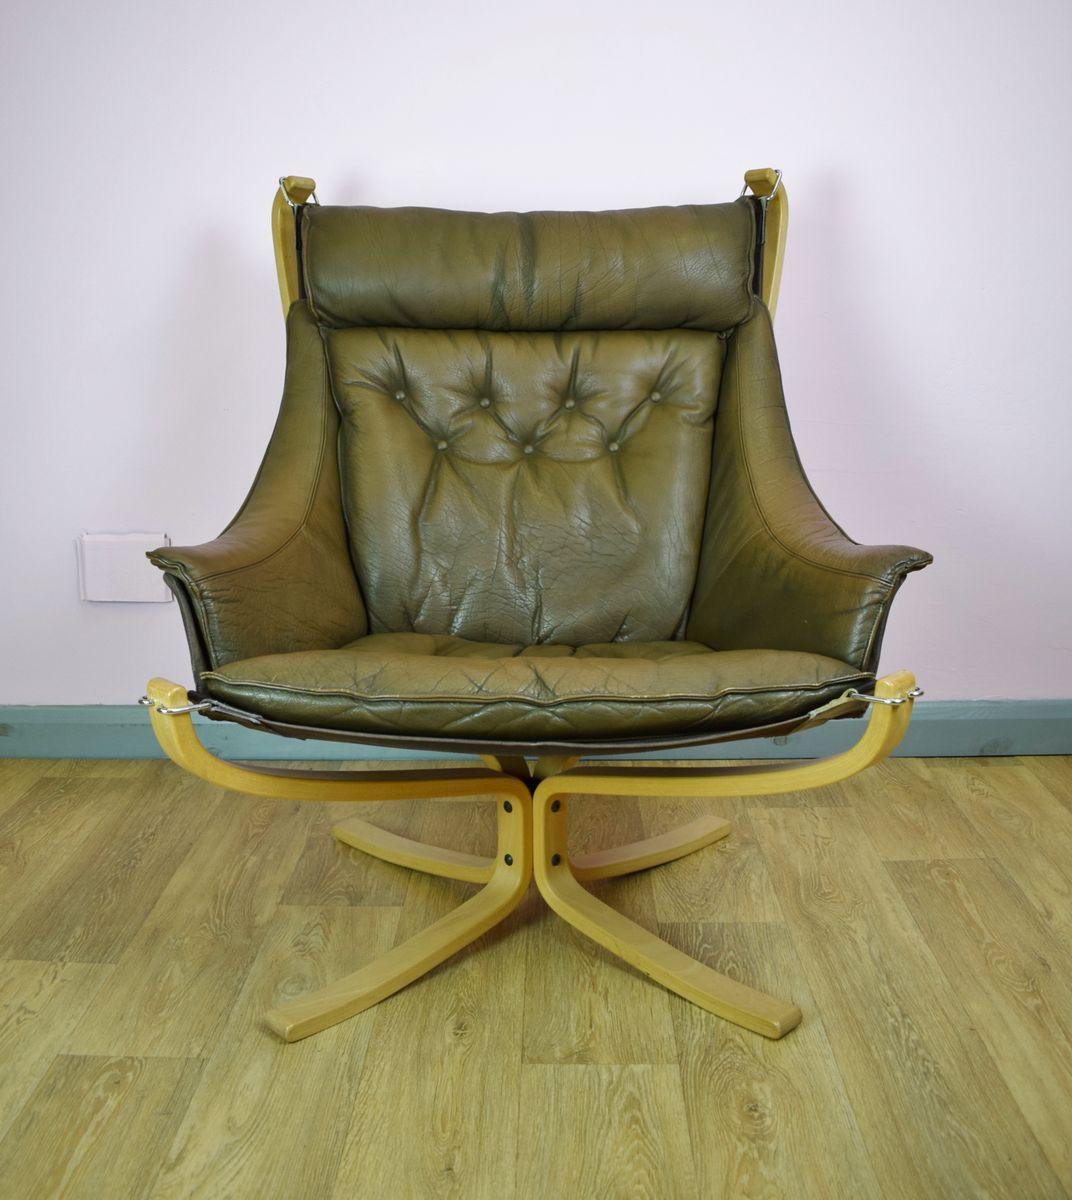 brauner d nischer leder falcon sessel von sigurd ressell f r vatne m bler 1970er bei pamono kaufen. Black Bedroom Furniture Sets. Home Design Ideas